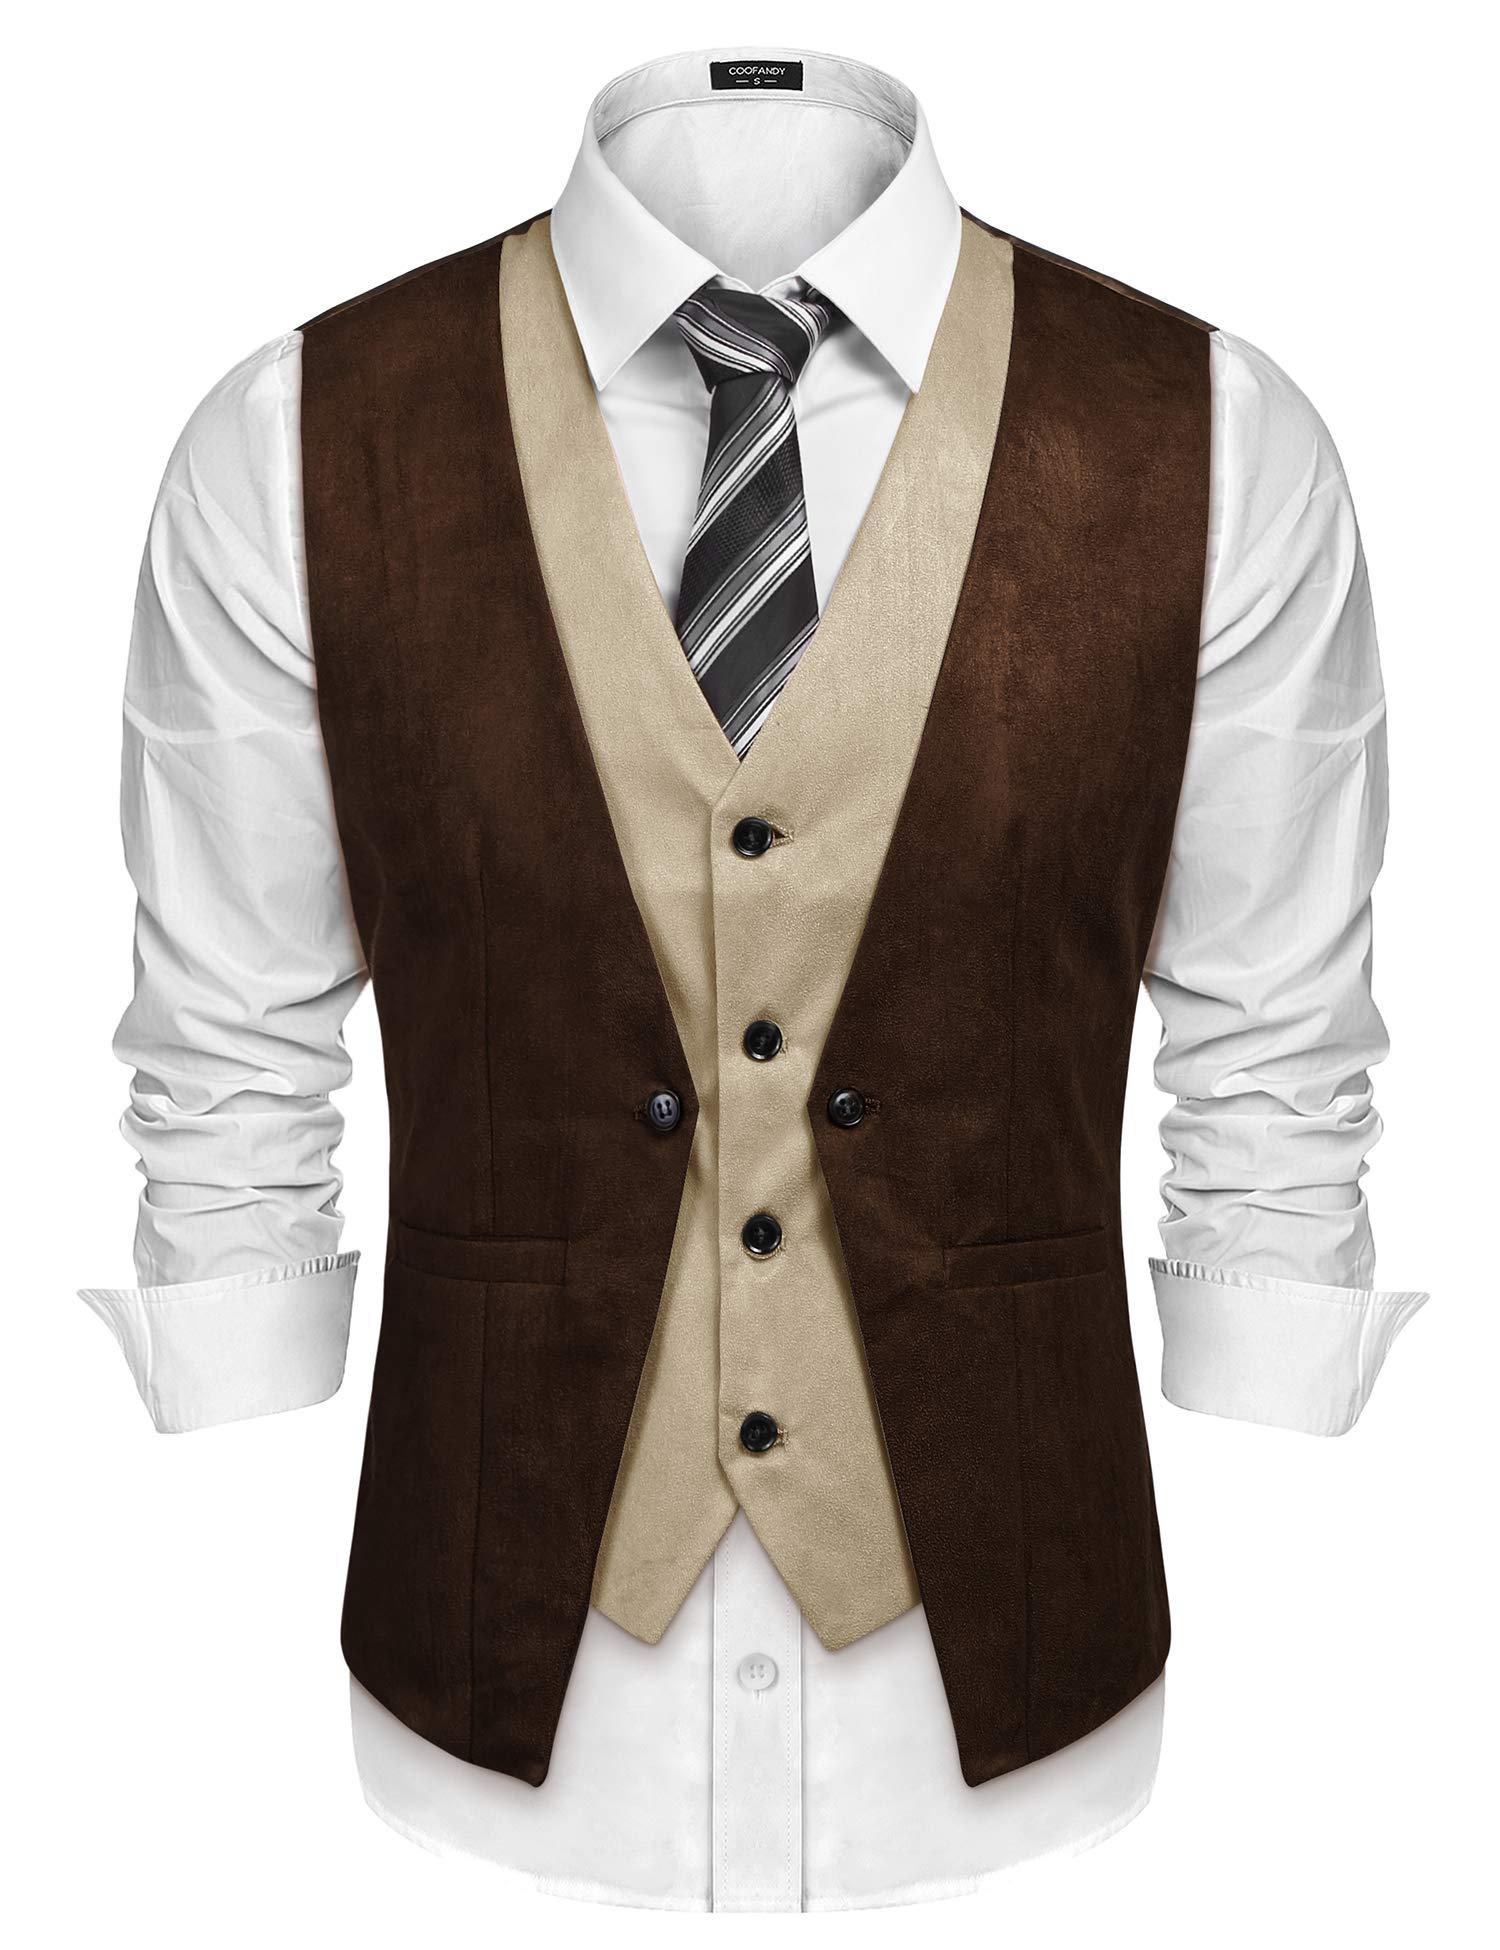 COOFANDY Men's Suede Leather Vest Layered Style Dress Vest Waistcoat, Coffe, X Large